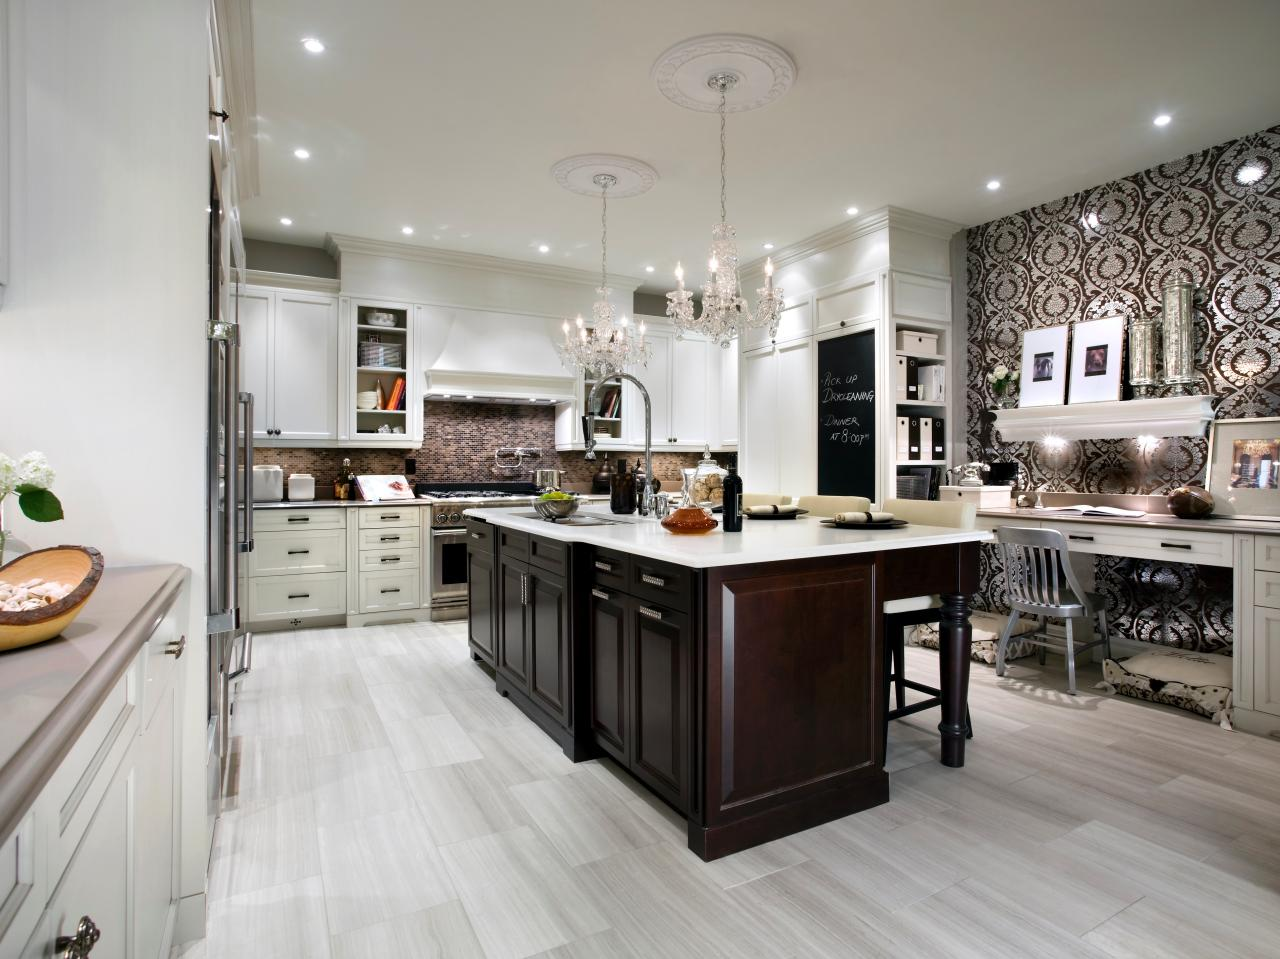 candice olson kitchen backsplash ideas photo - 4